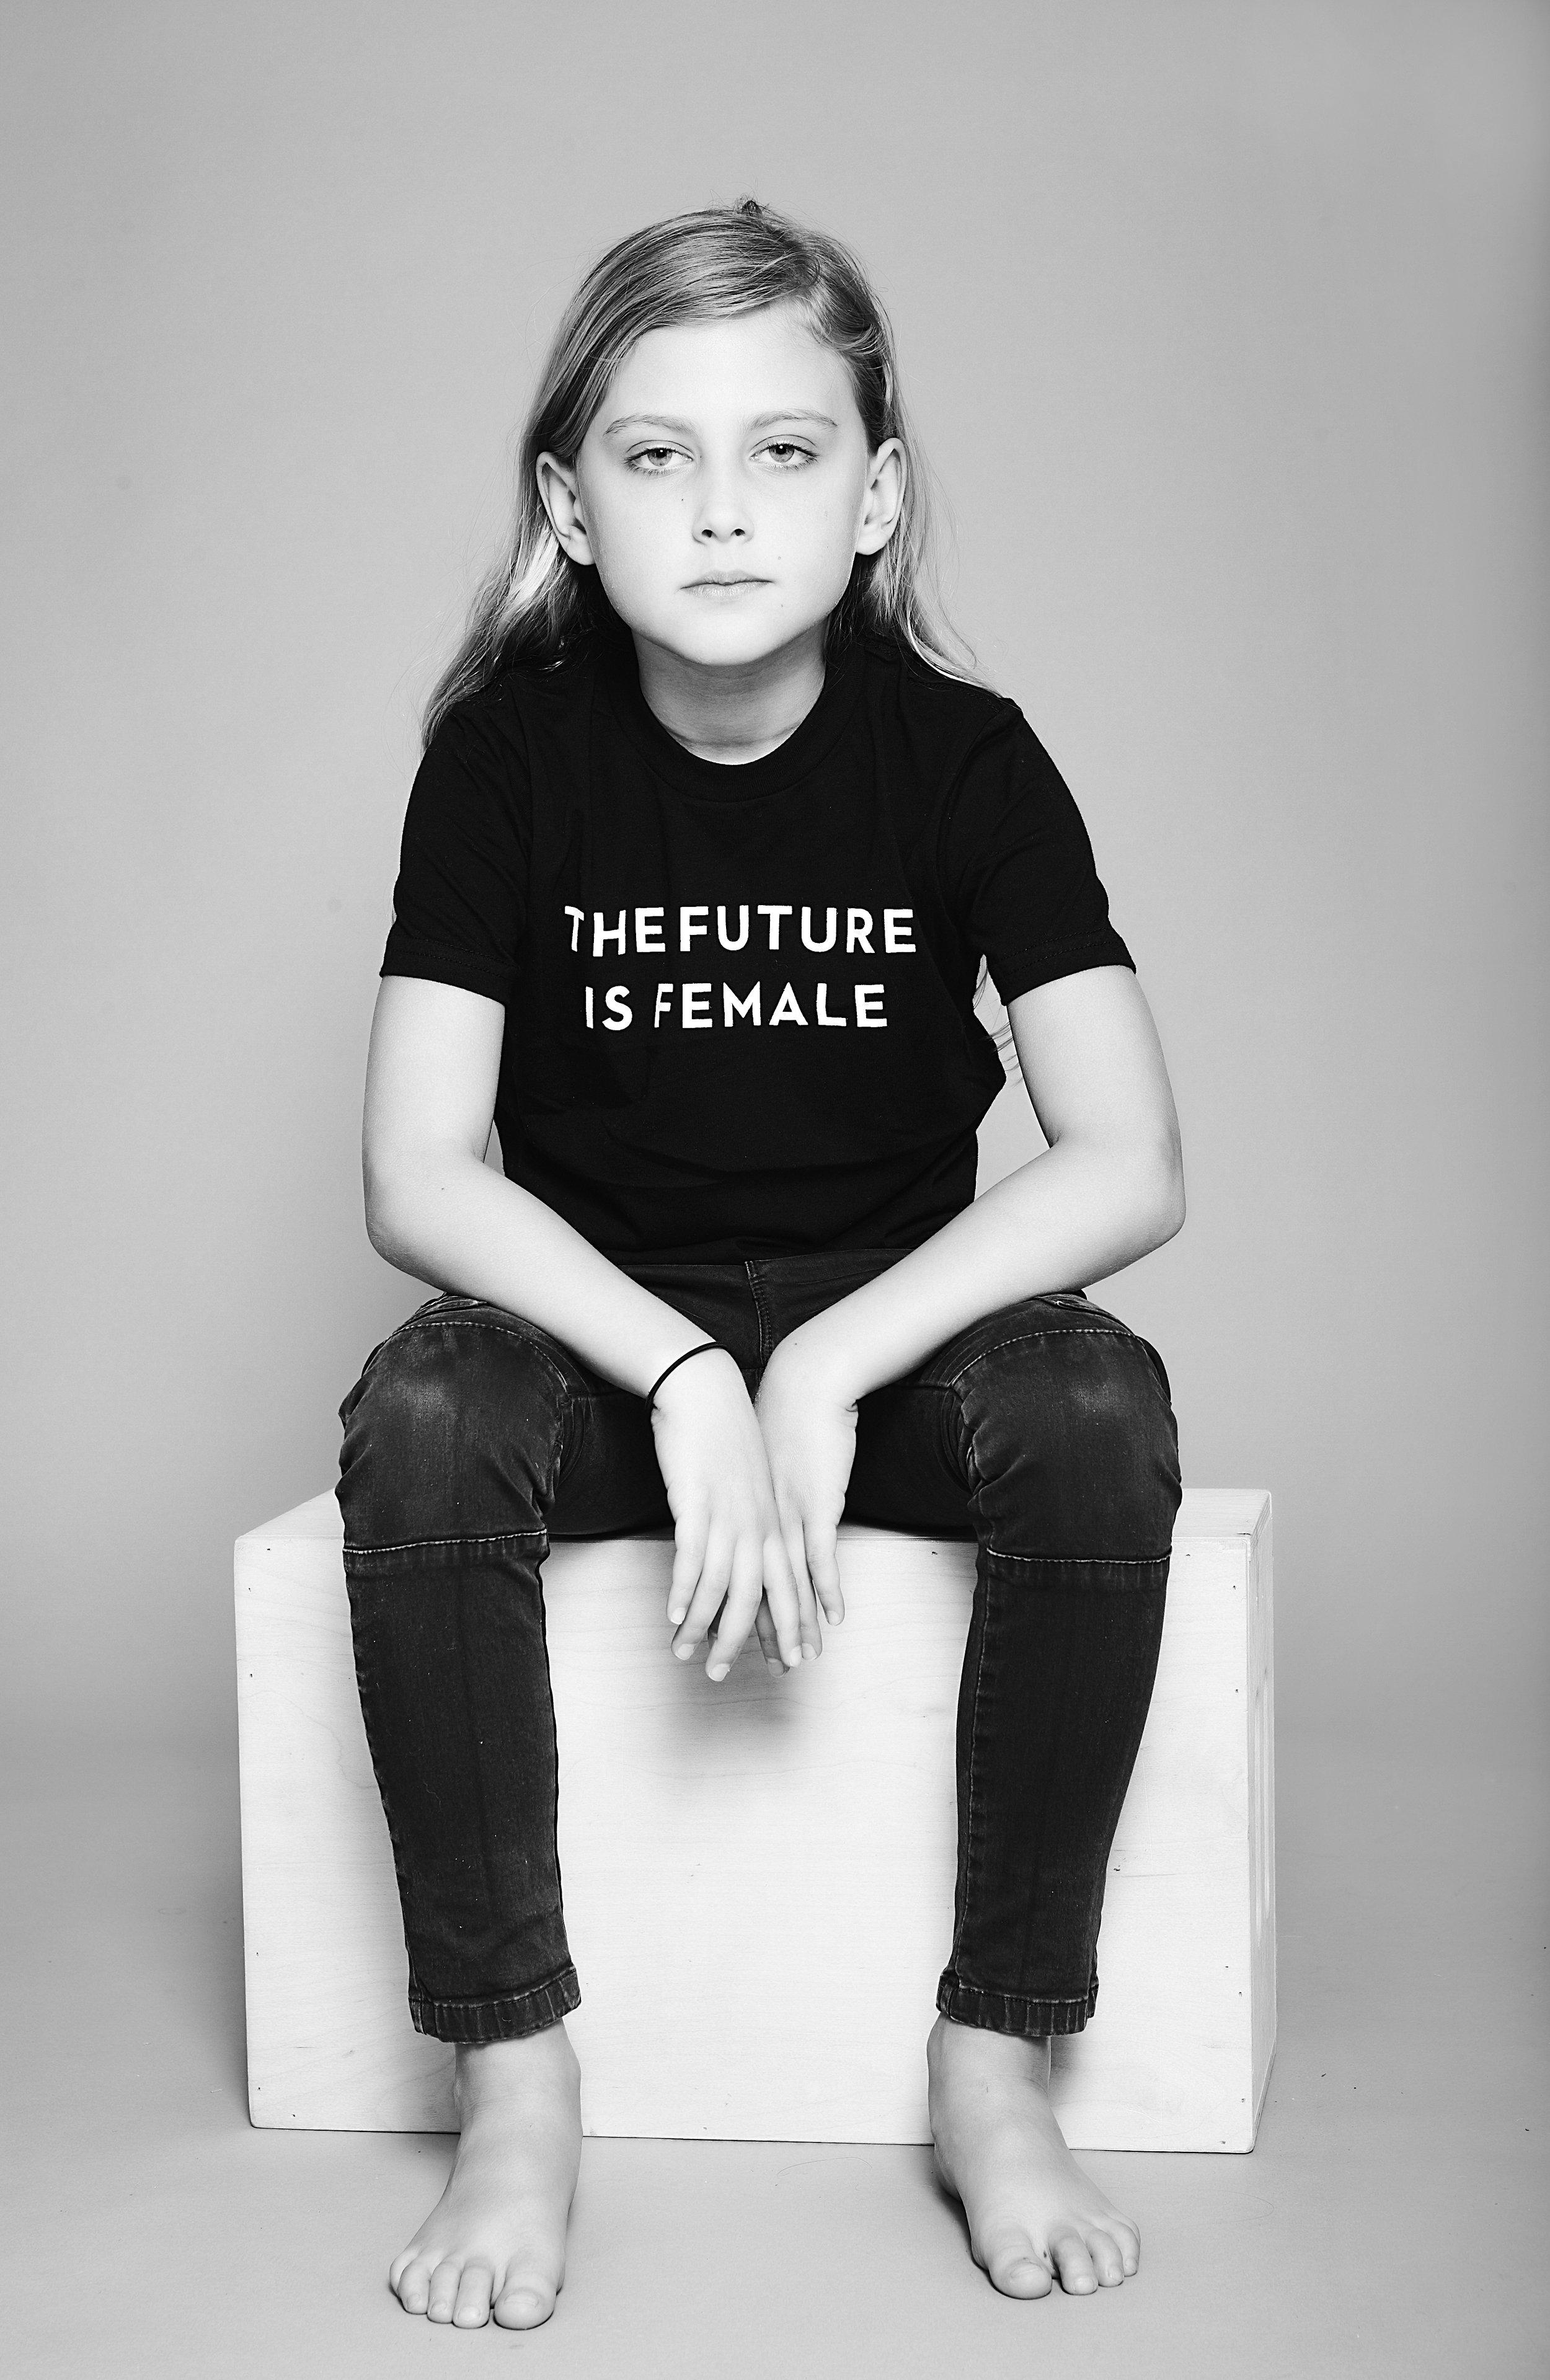 2017_the_future_is_female_012_bw_r.jpg